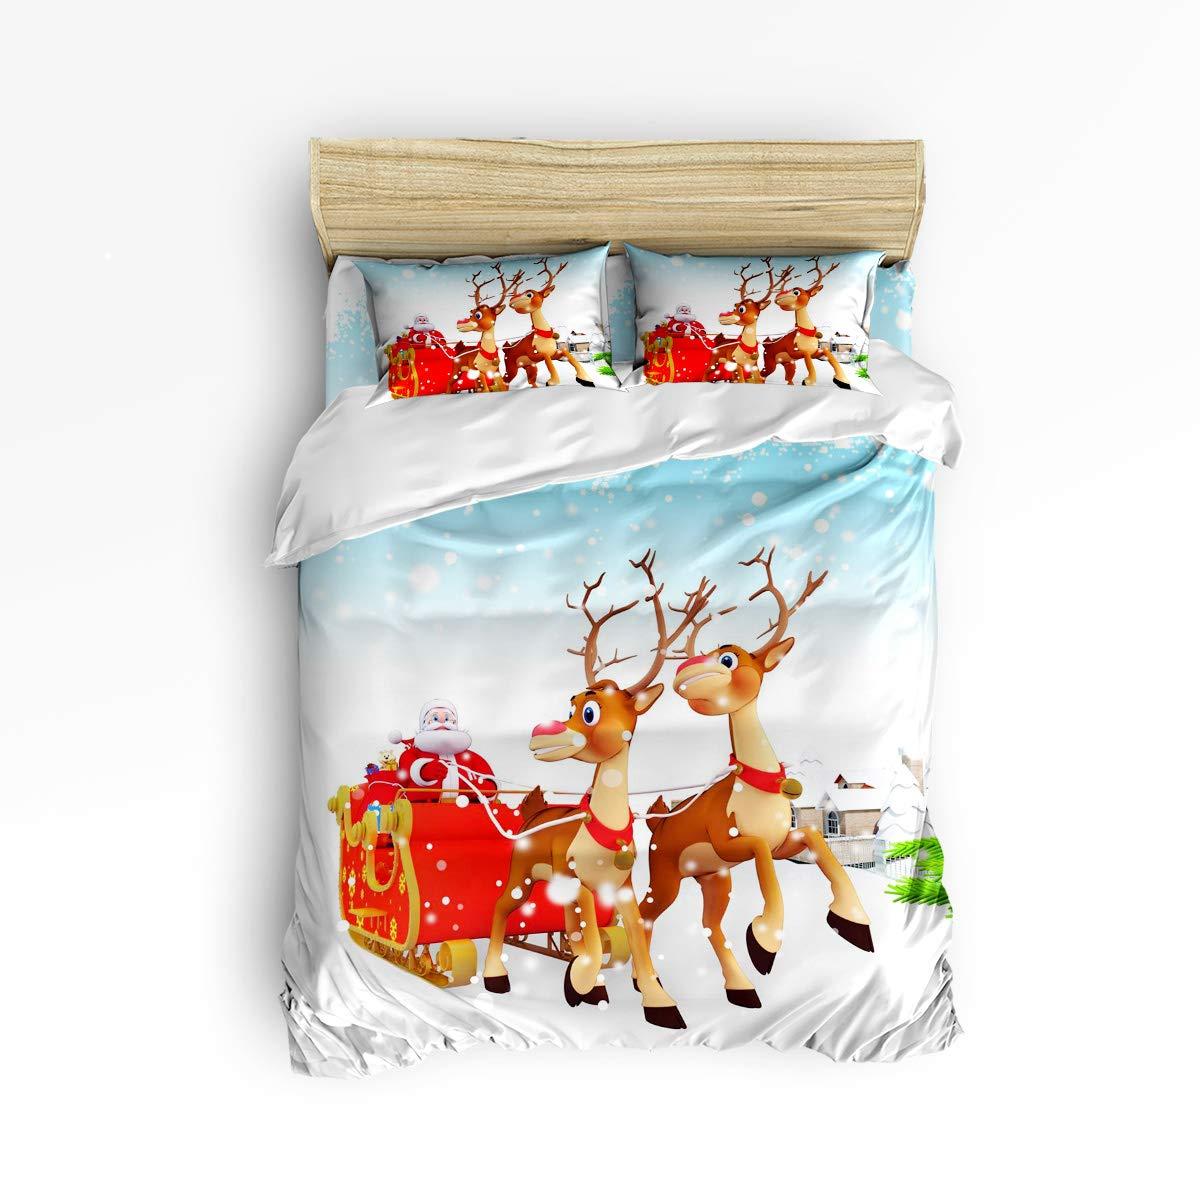 EZON-CH 掛け布団カバーセット 快適な寝具セット グレー大理石タイル ソフトベッドセット 大人 十代 子供 女の子 男の子用 羽毛布団カバー1枚 ベッドシーツ1枚 枕カバー2枚 フルサイズ 181112WHLWHLEZONSJTSLXM01695SJTBEZN B07KFK1Y1Q Christmas773lezn5577 フルサイズ